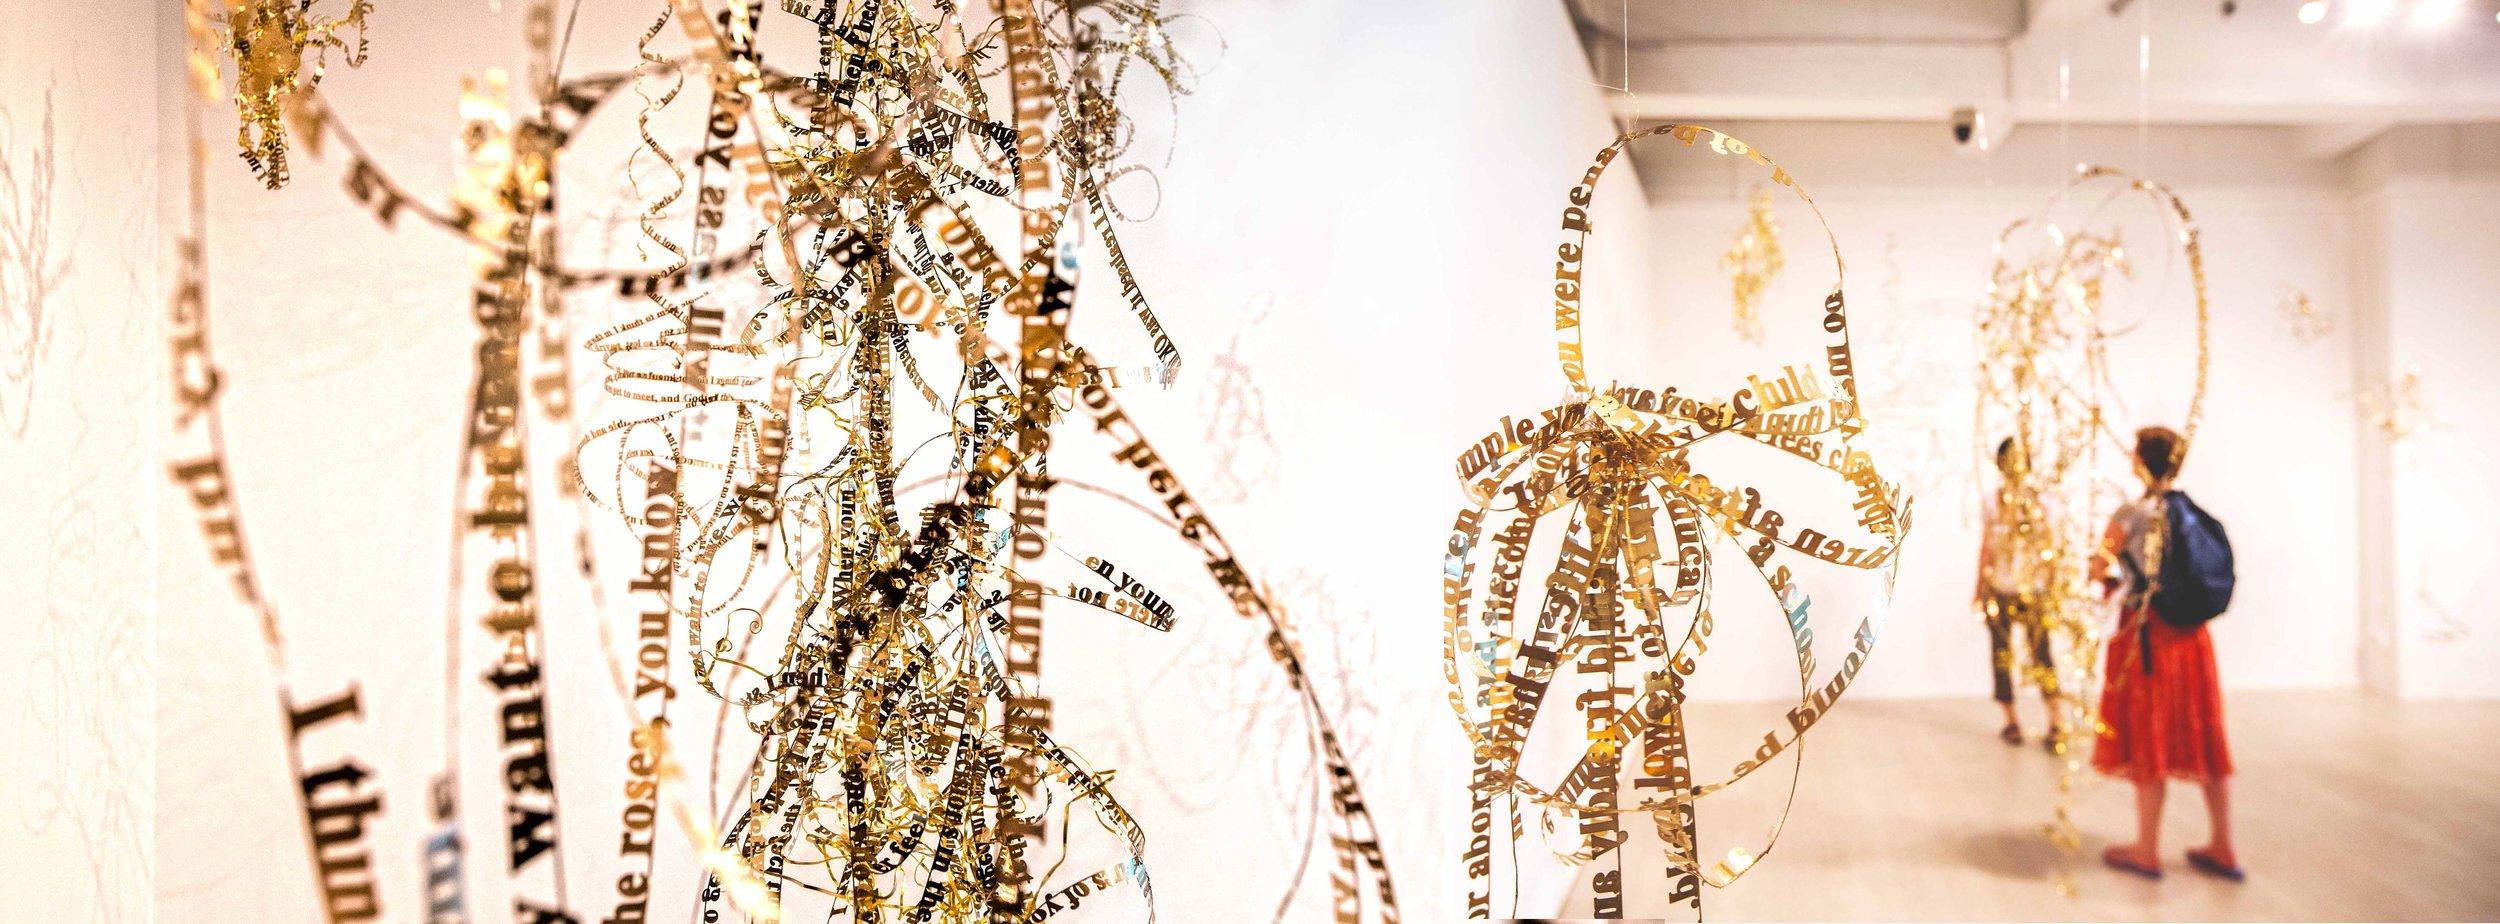 Nicola Anthony, text sculptures 2017